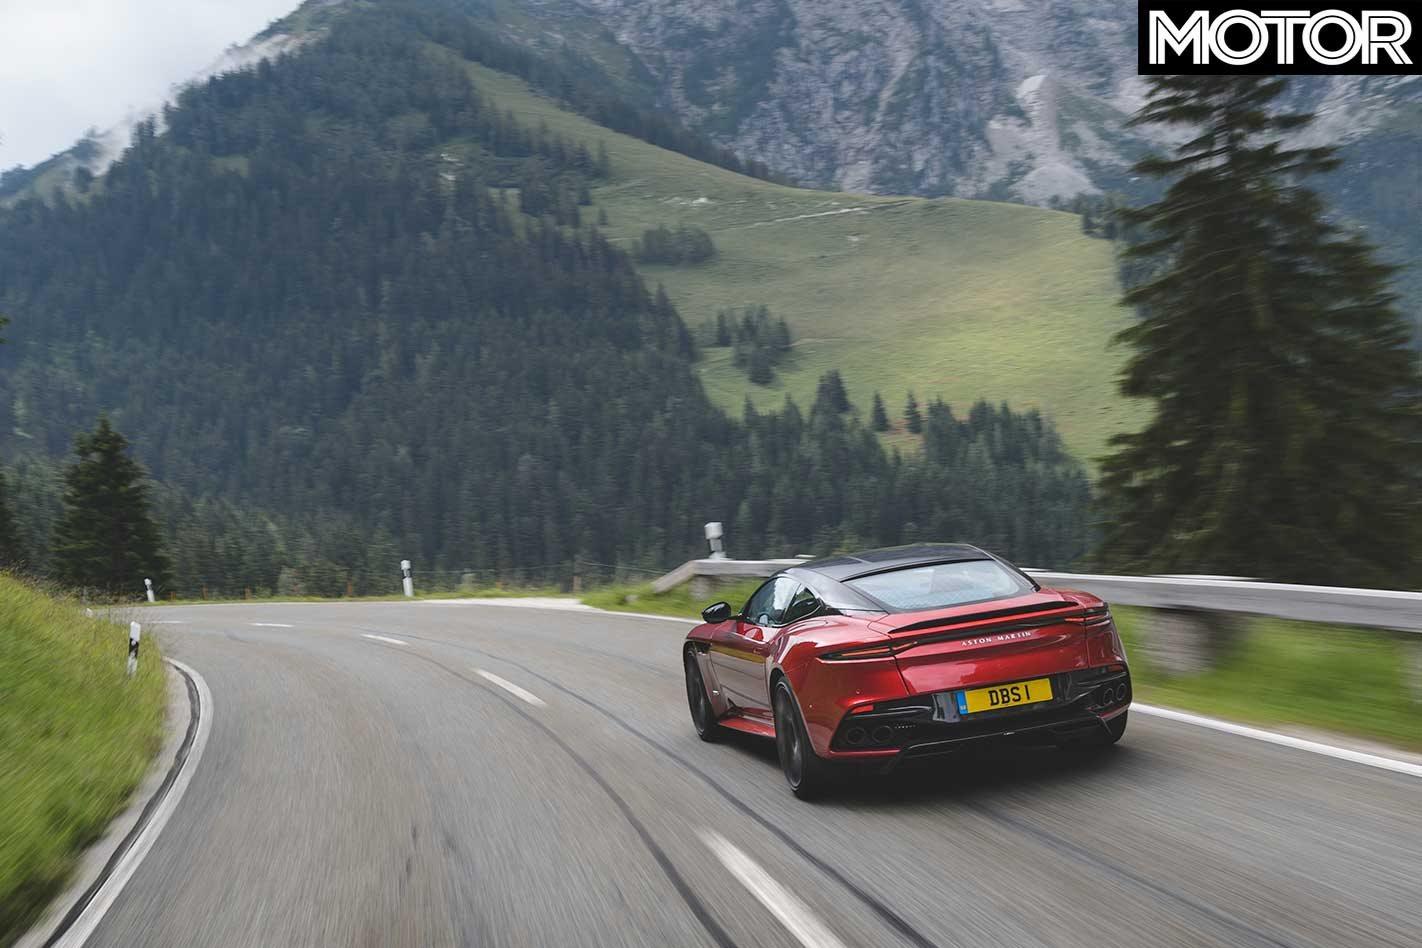 2018 Aston Martin DBS Superleggera performance review